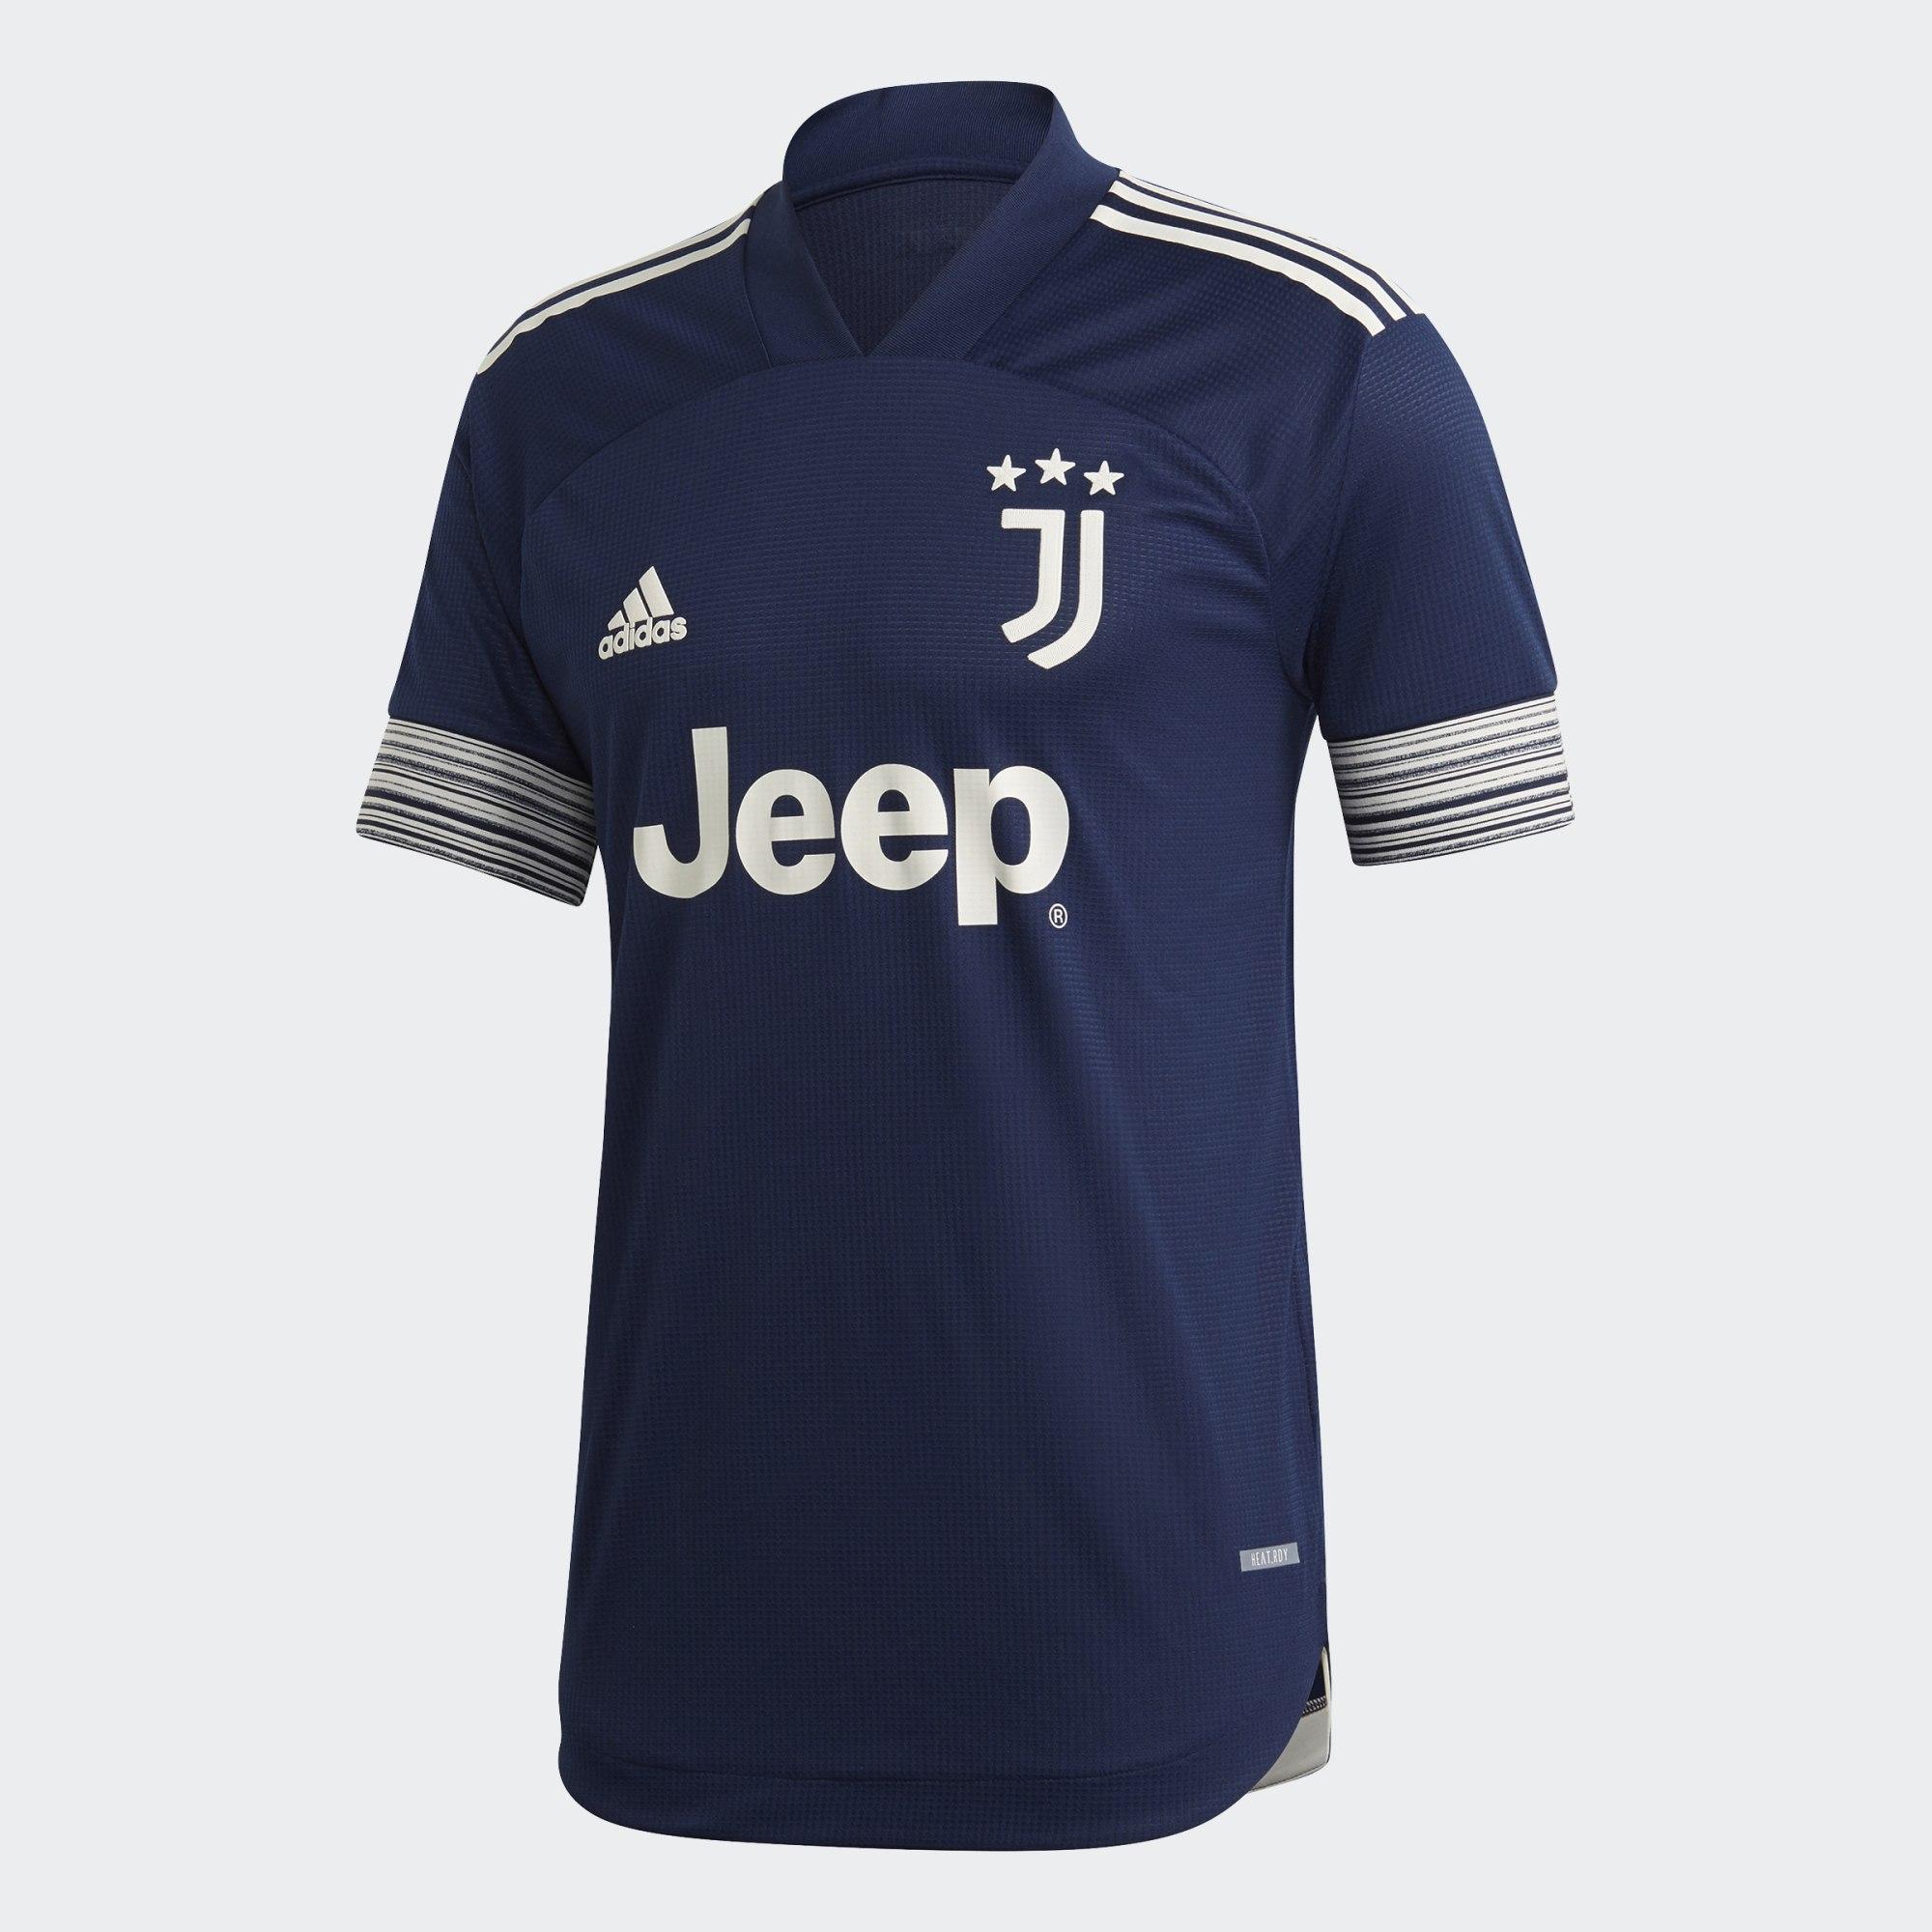 Juventus 2020-21 Adidas Away Kit | 20/21 Kits | Football ...